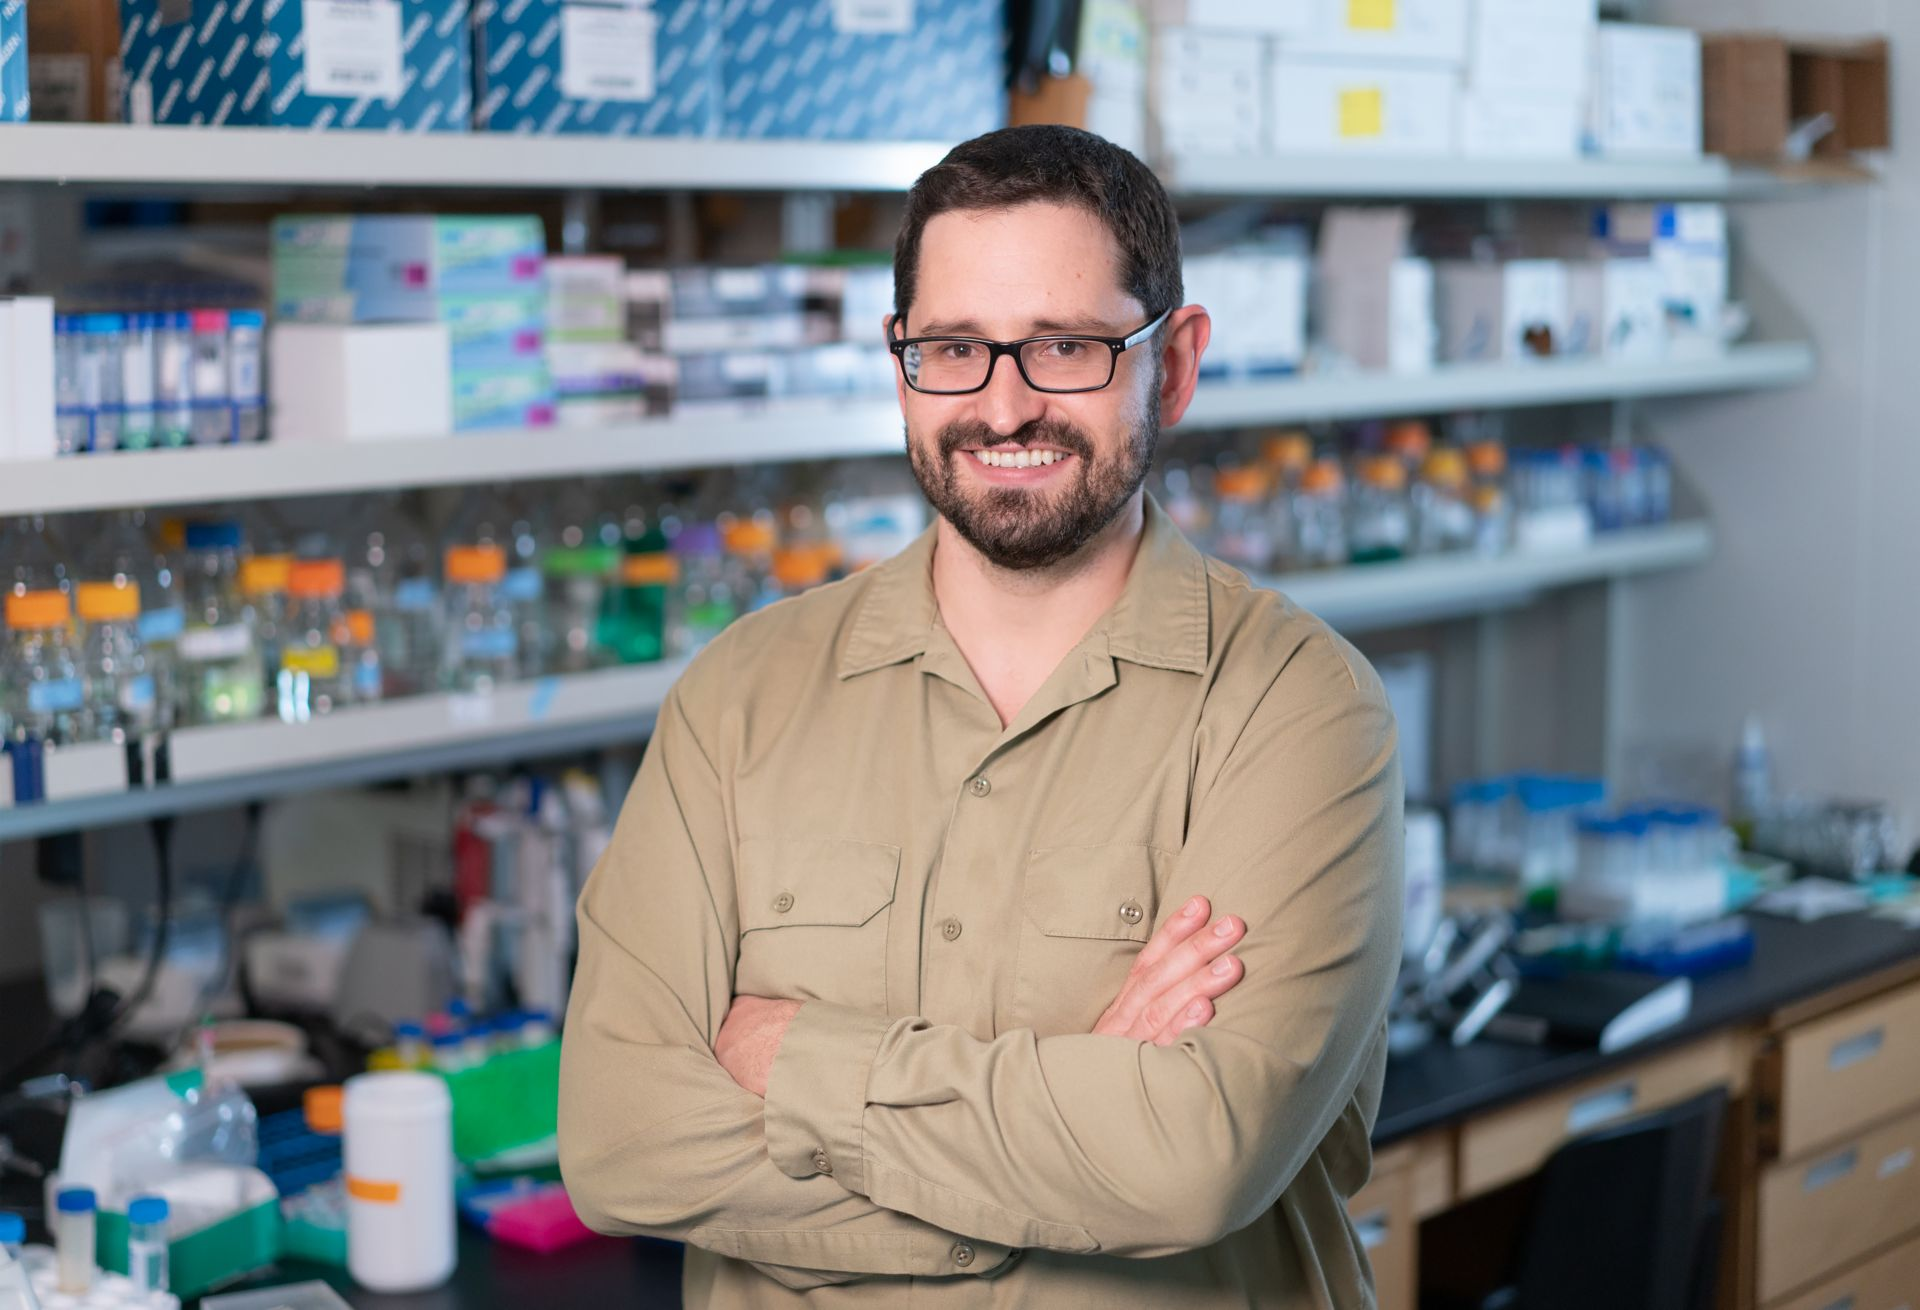 Wade Borcherds, PhD